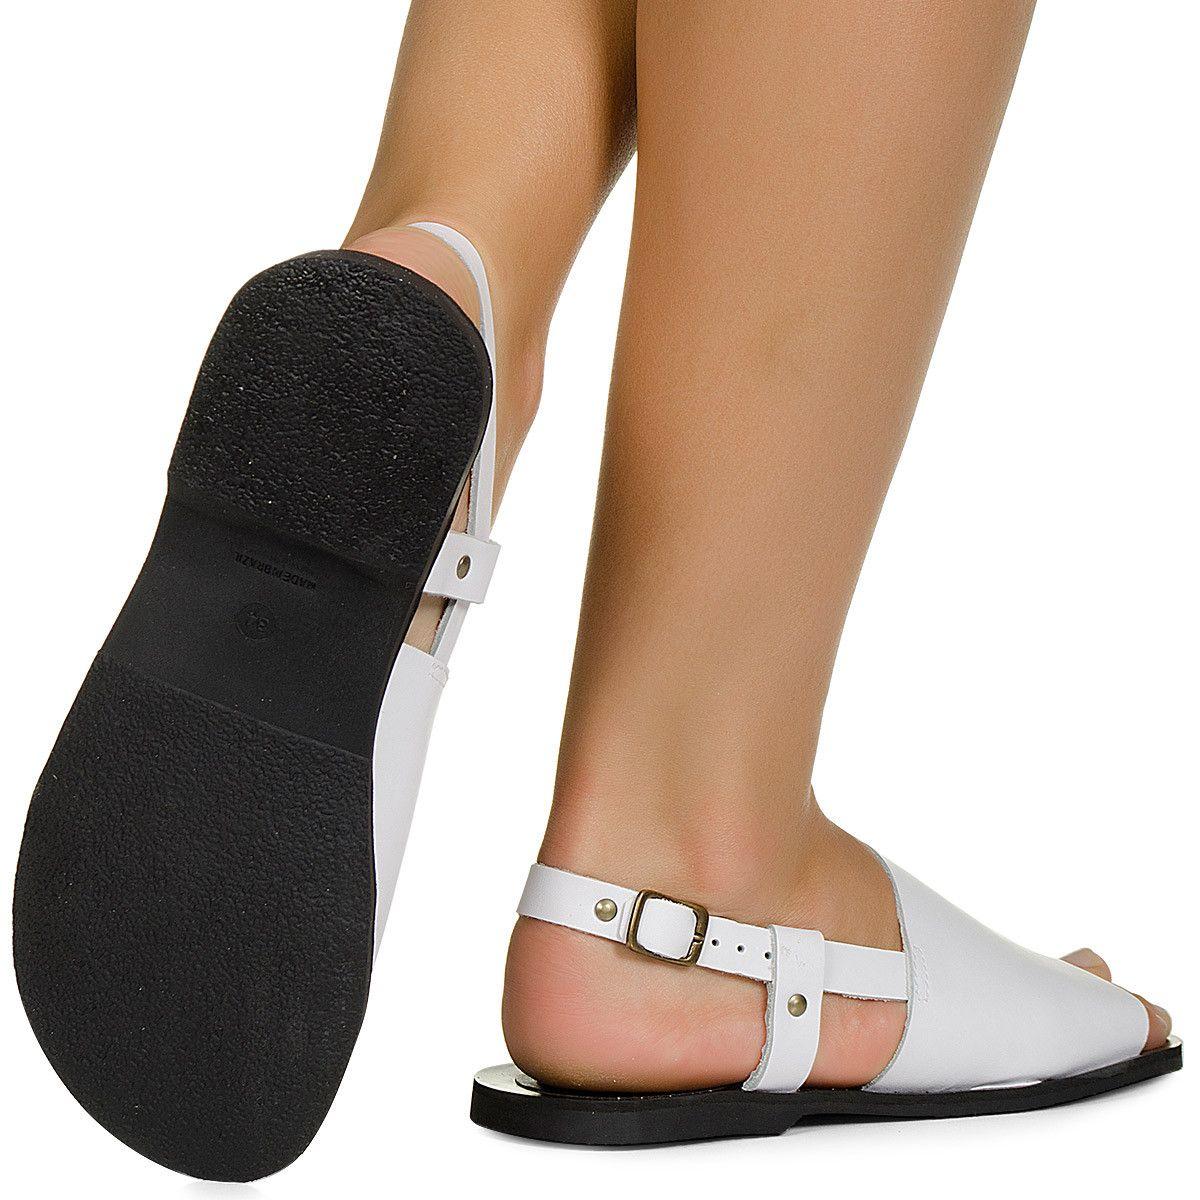 39200b9cb Rasteira avarca branca Taquilla - Taquilla - Loja online de sapatos  femininos Lojas De Calçados Femininos